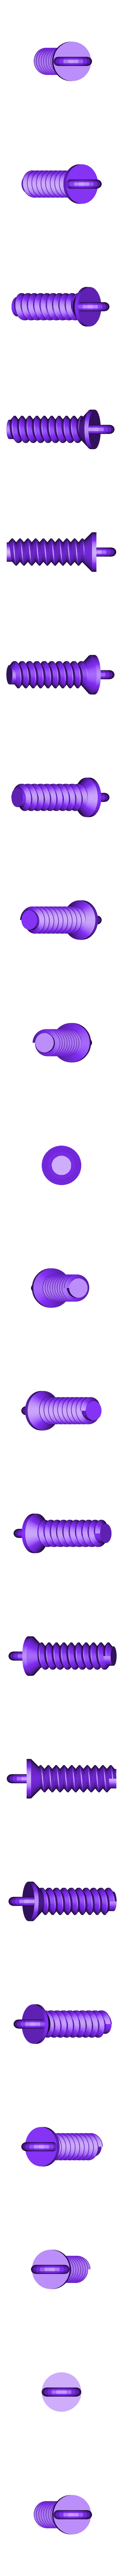 ZBKartWheel_screw_ver01.stl Download free STL file ZB KartWheel - Nintendo Switch Steering Wheel • 3D printing design, Zippityboomba